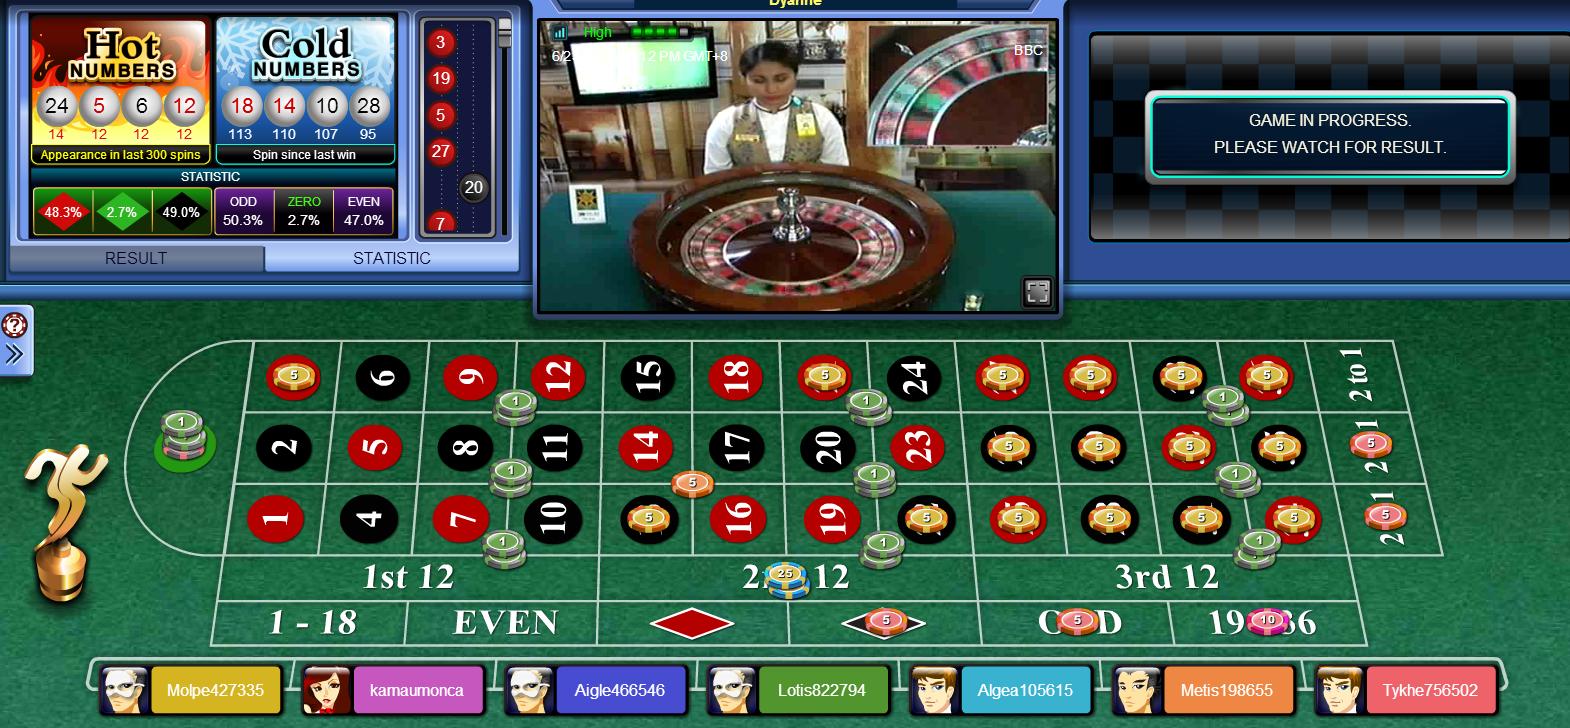 Cara Daftar Sbobet Casino ~ Casino Sbobet